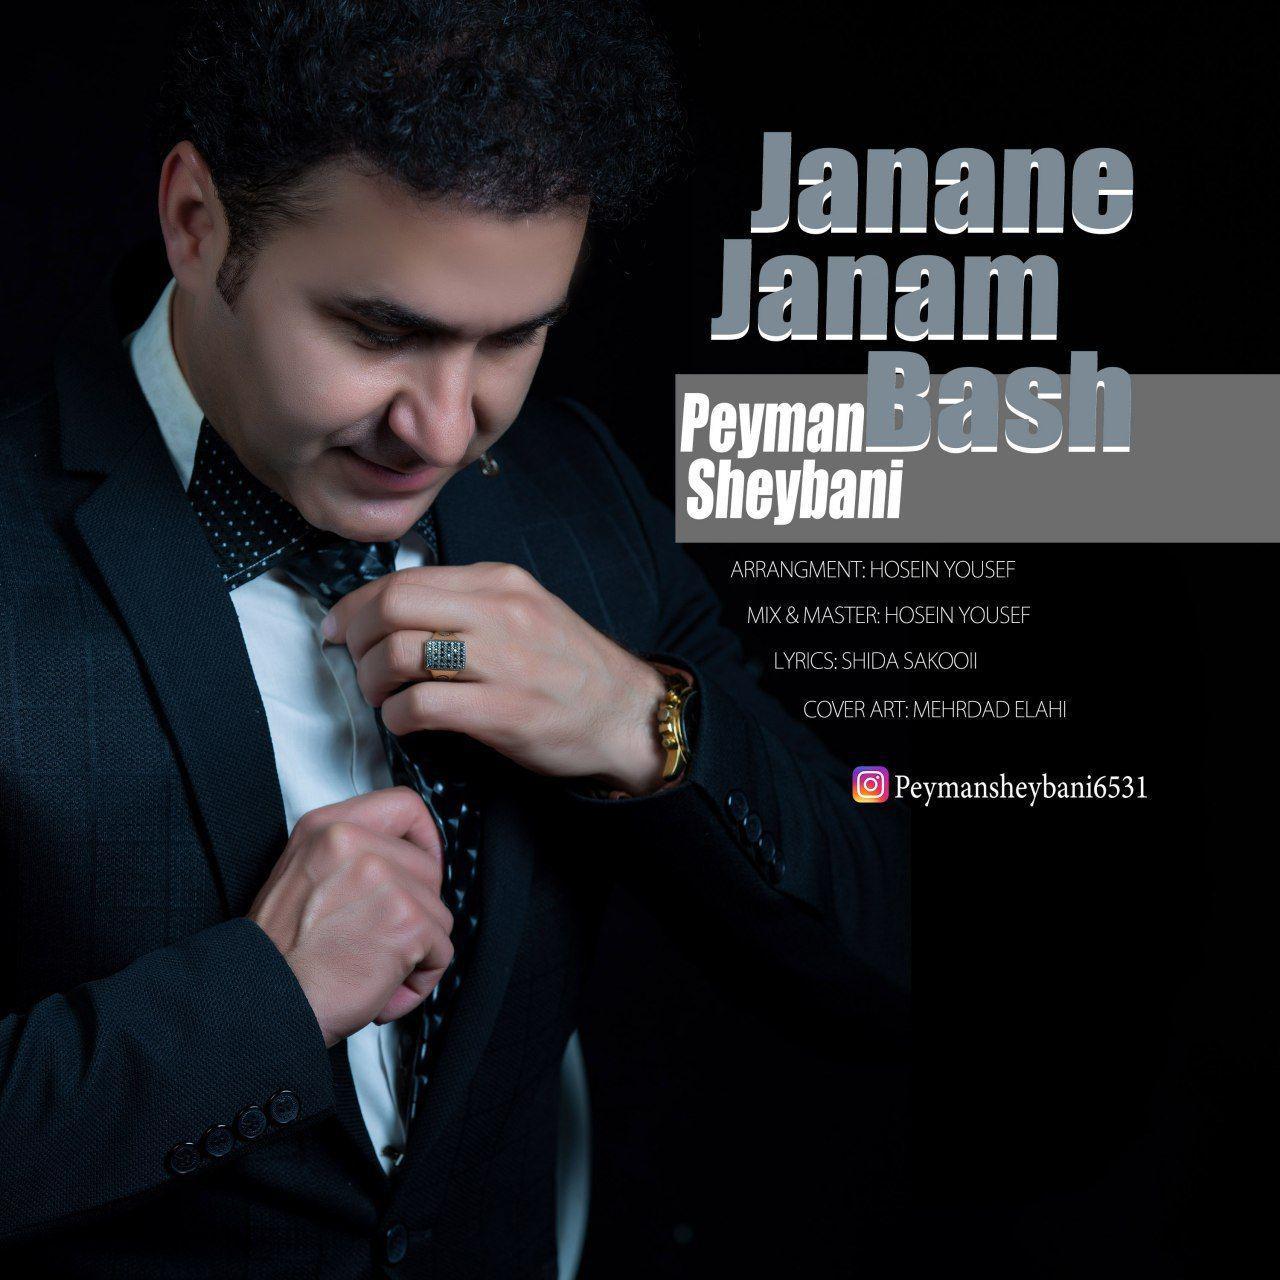 Peyman Sheybani - Janane Janam Bash Music | آهنگ پیمان شیبانی - جانان جانم باش